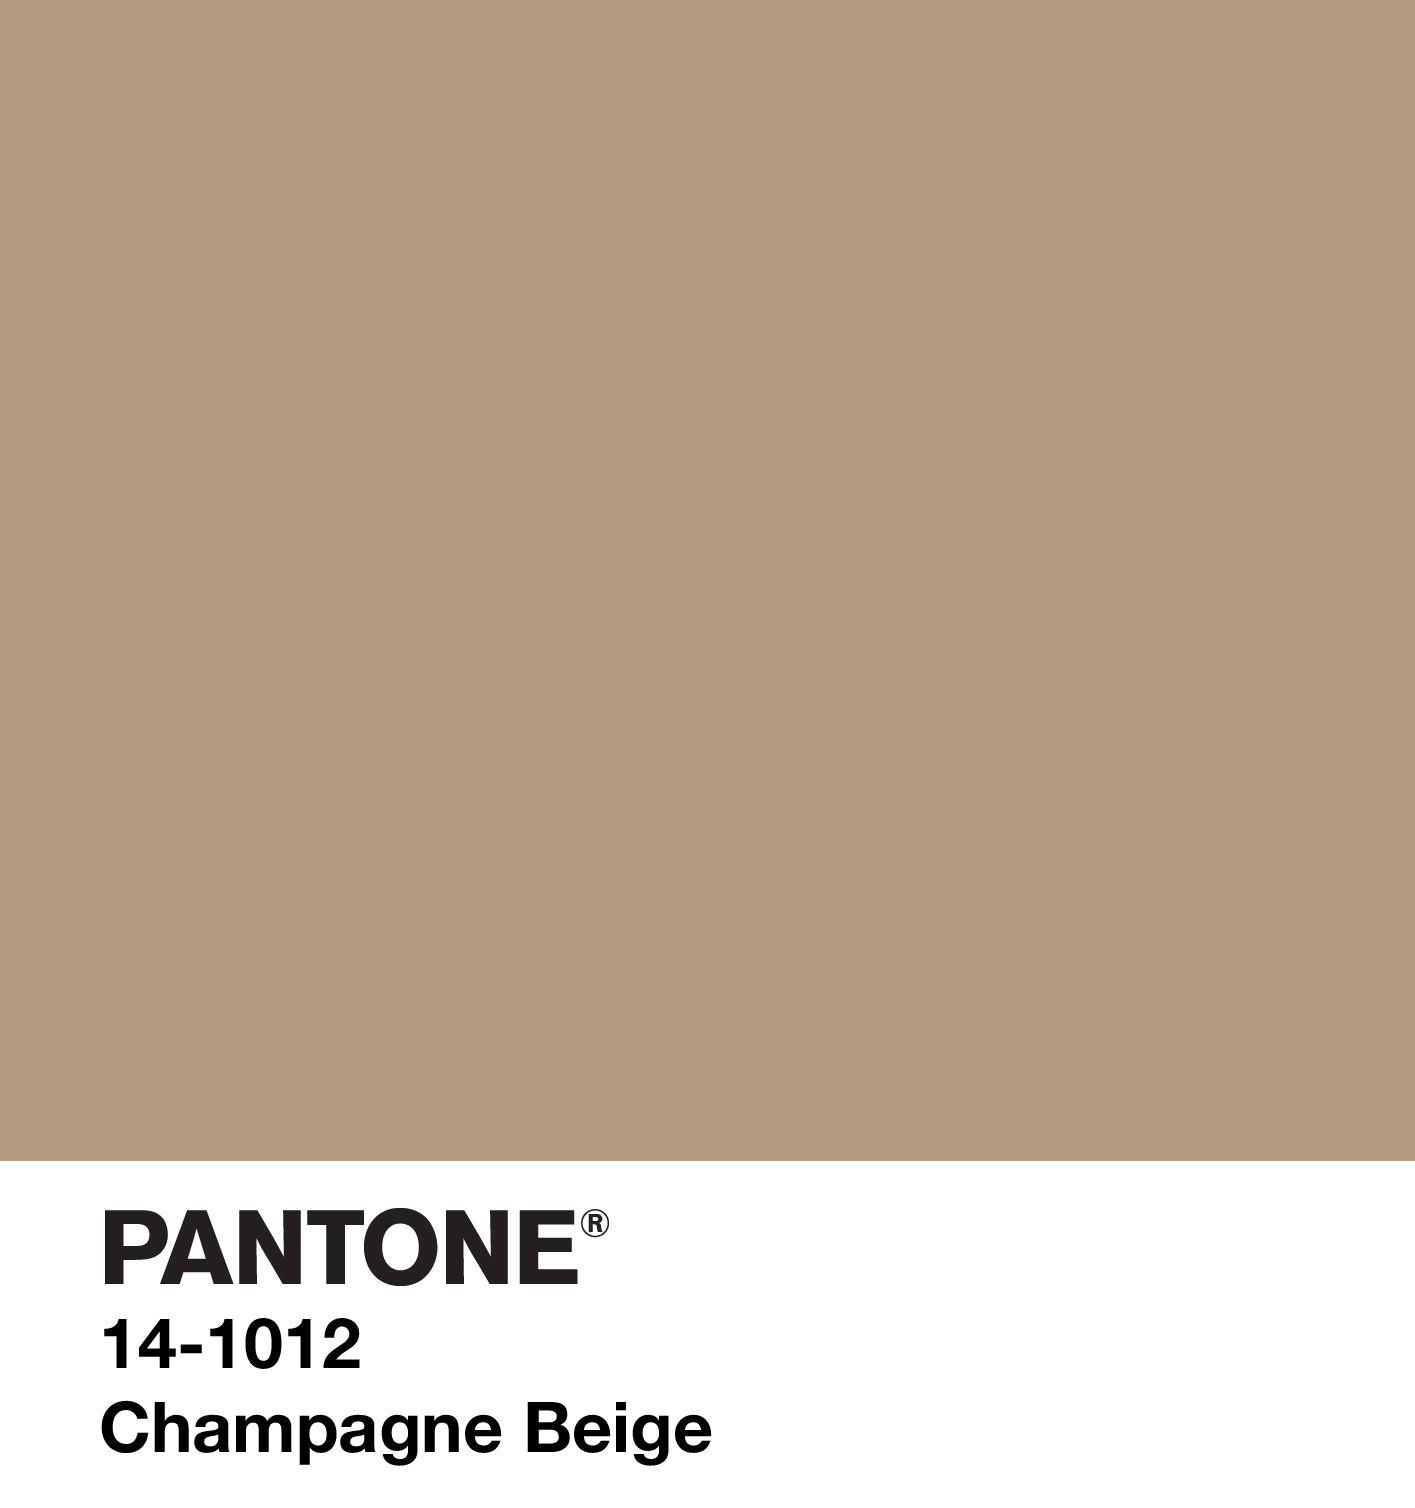 Champagne beige marrons e beges pinterest pantone for Brown beige paint color